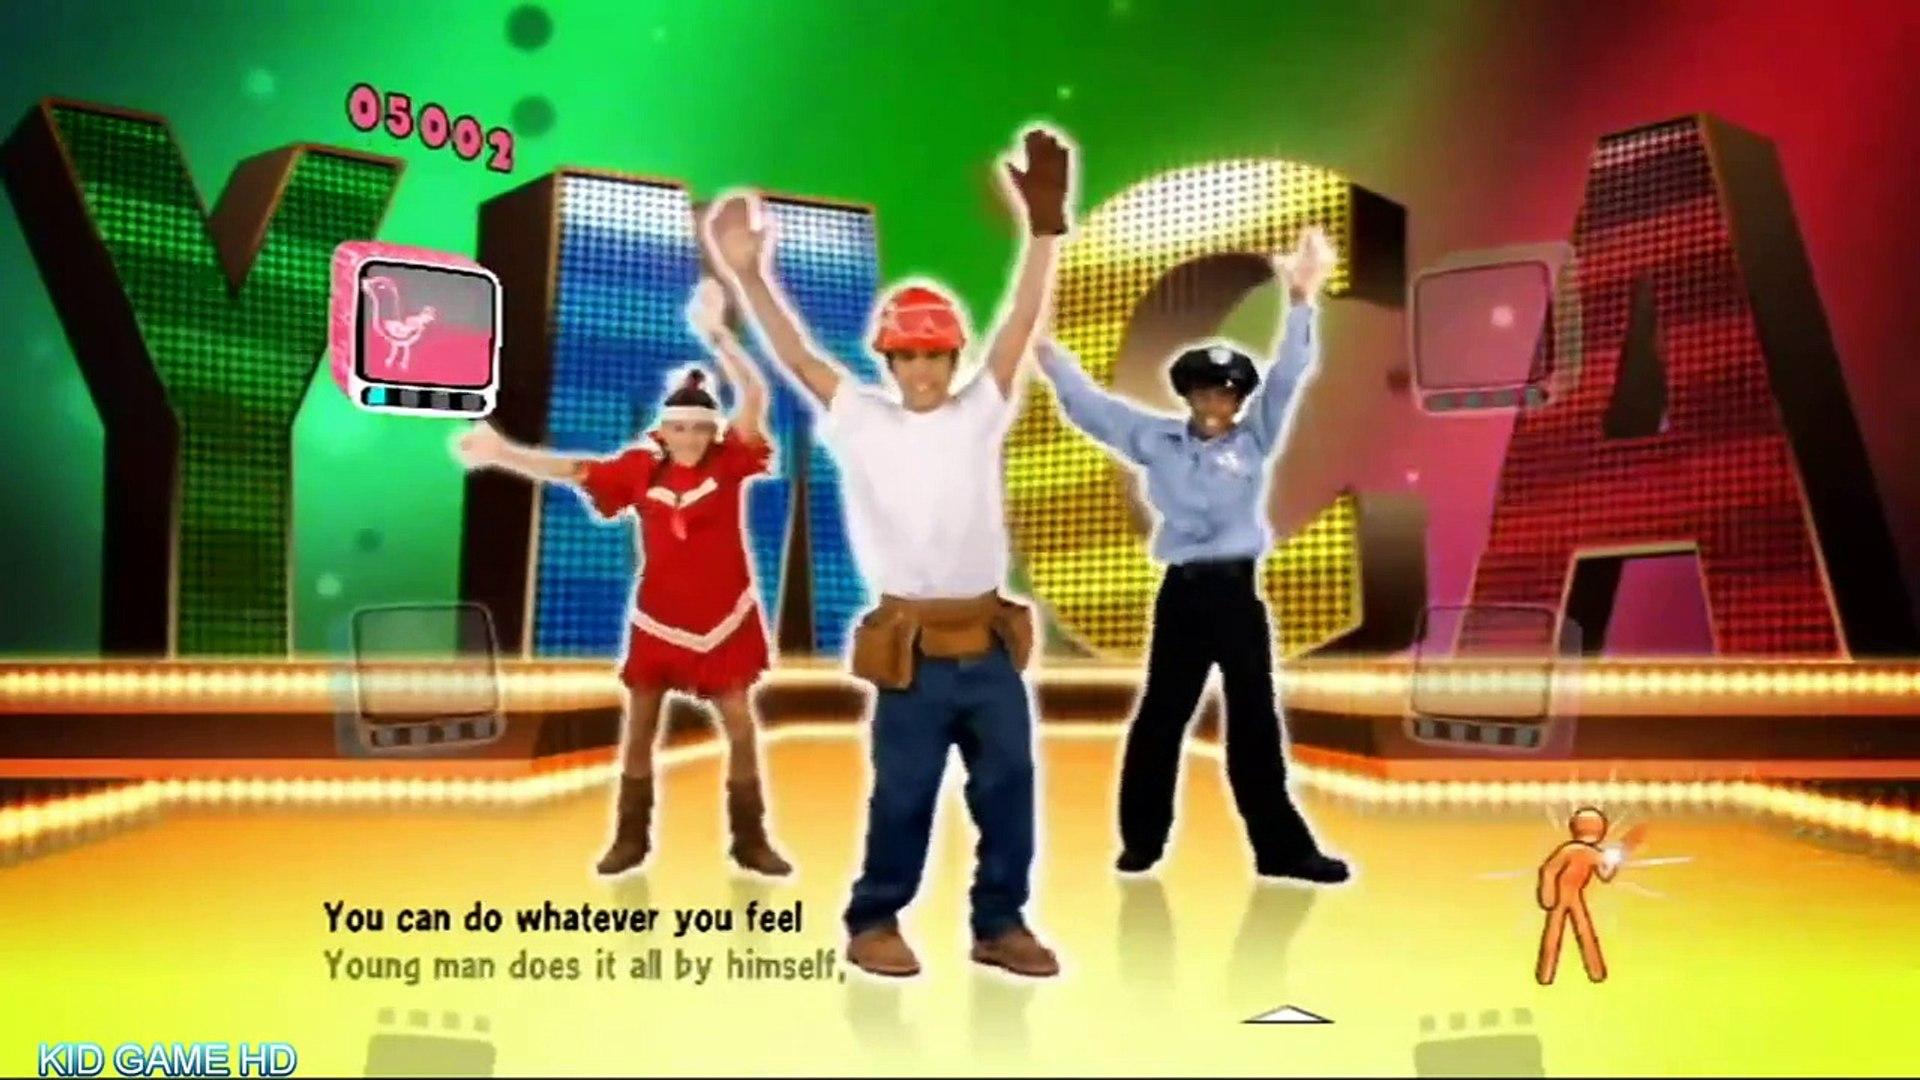 JUST DANCE KIDS | 1080p MOVIE Game | YMCA | CARS KID GAME HD